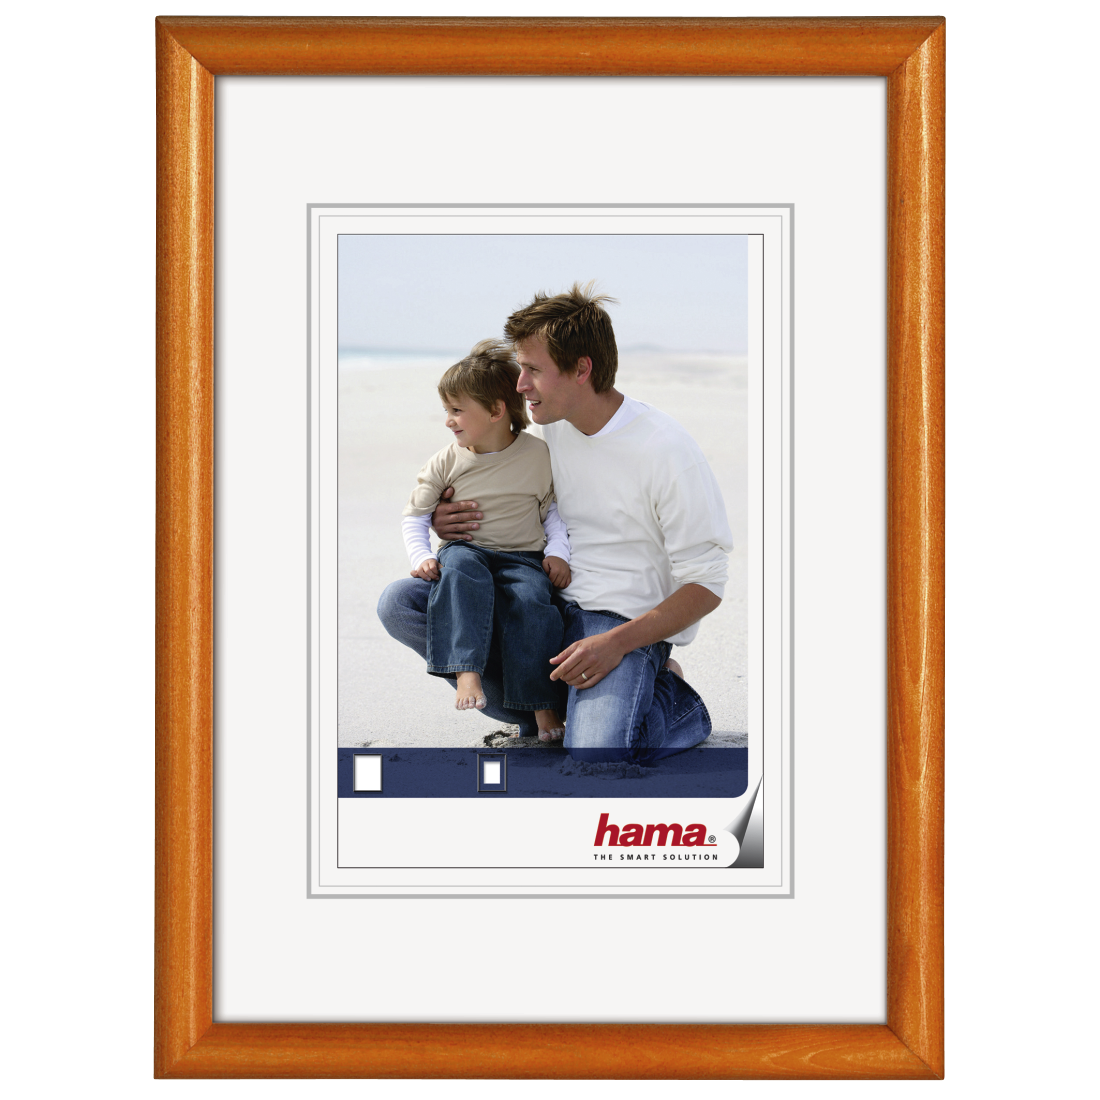 hama.com | 00067647 Hama Holzrahmen \